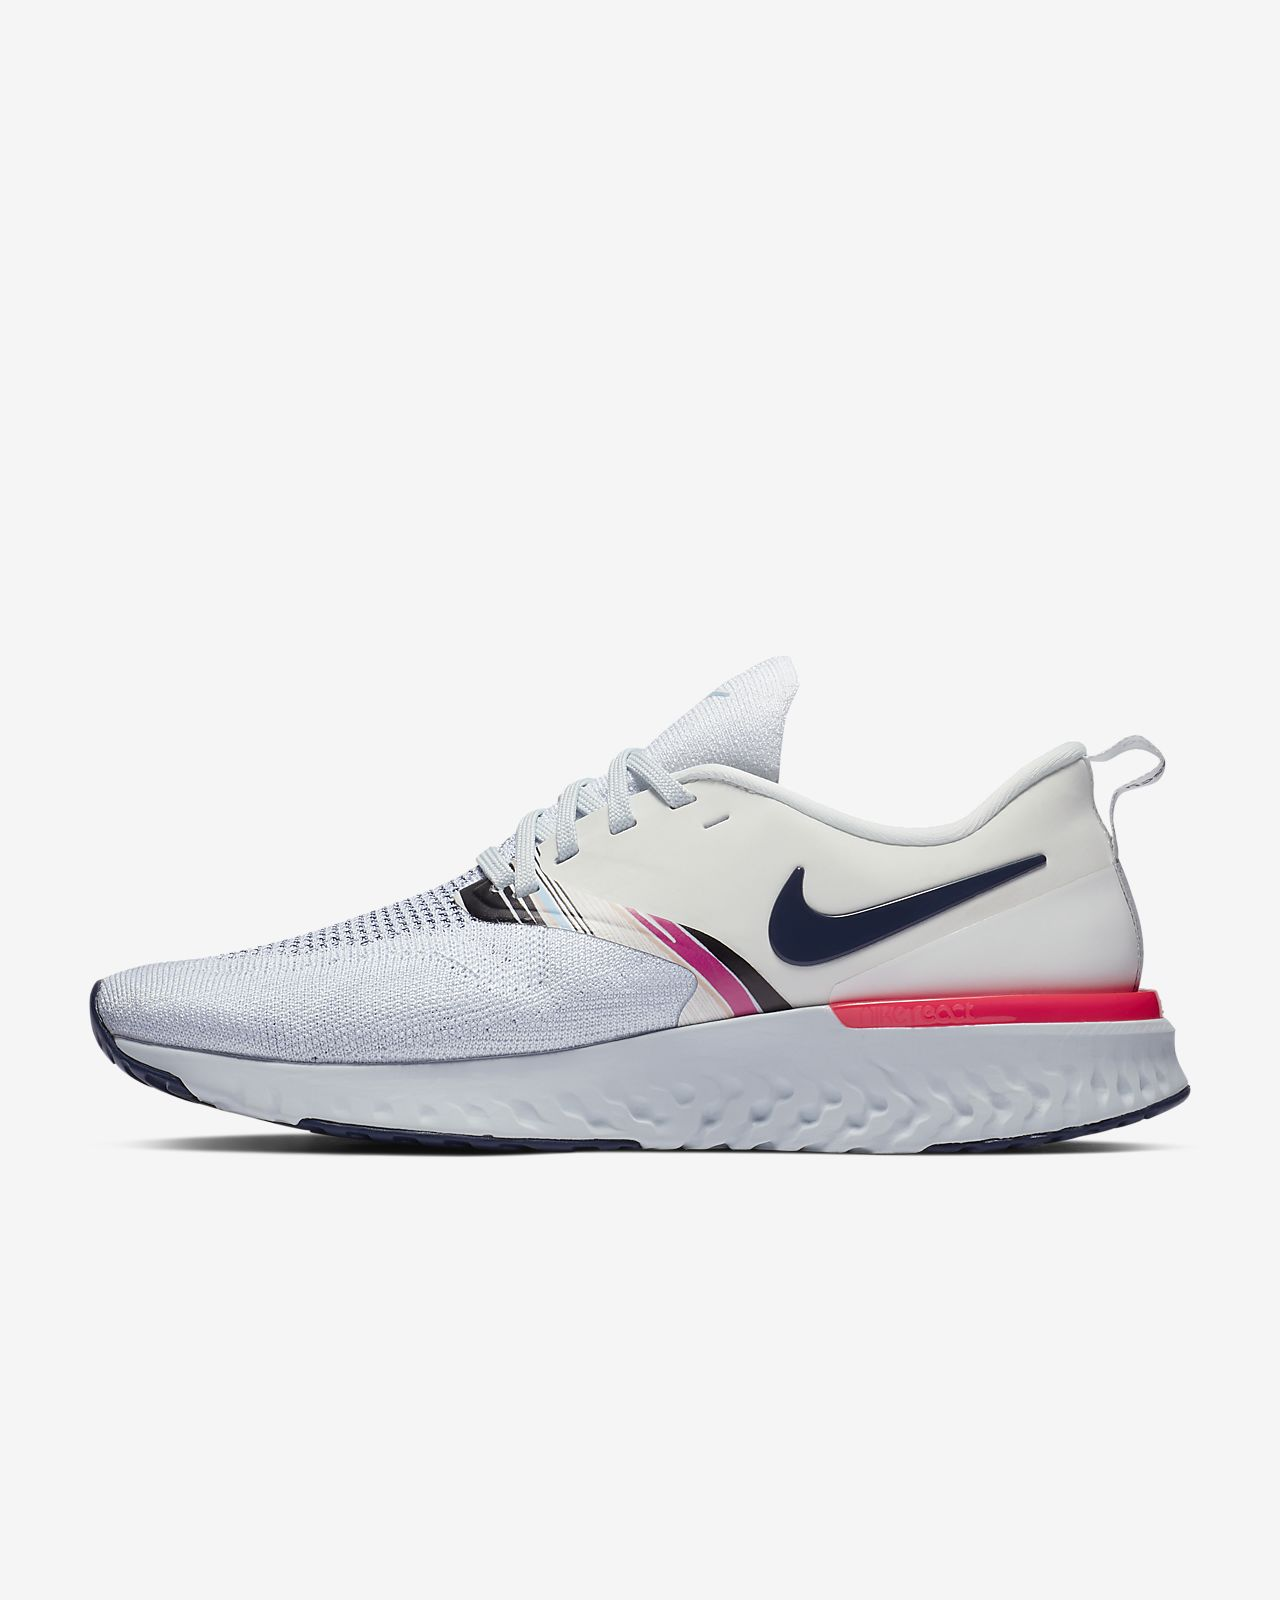 b8d9ff41765e3a Nike Odyssey React Flyknit 2 Premium Damen-Laufschuh. Nike.com DE